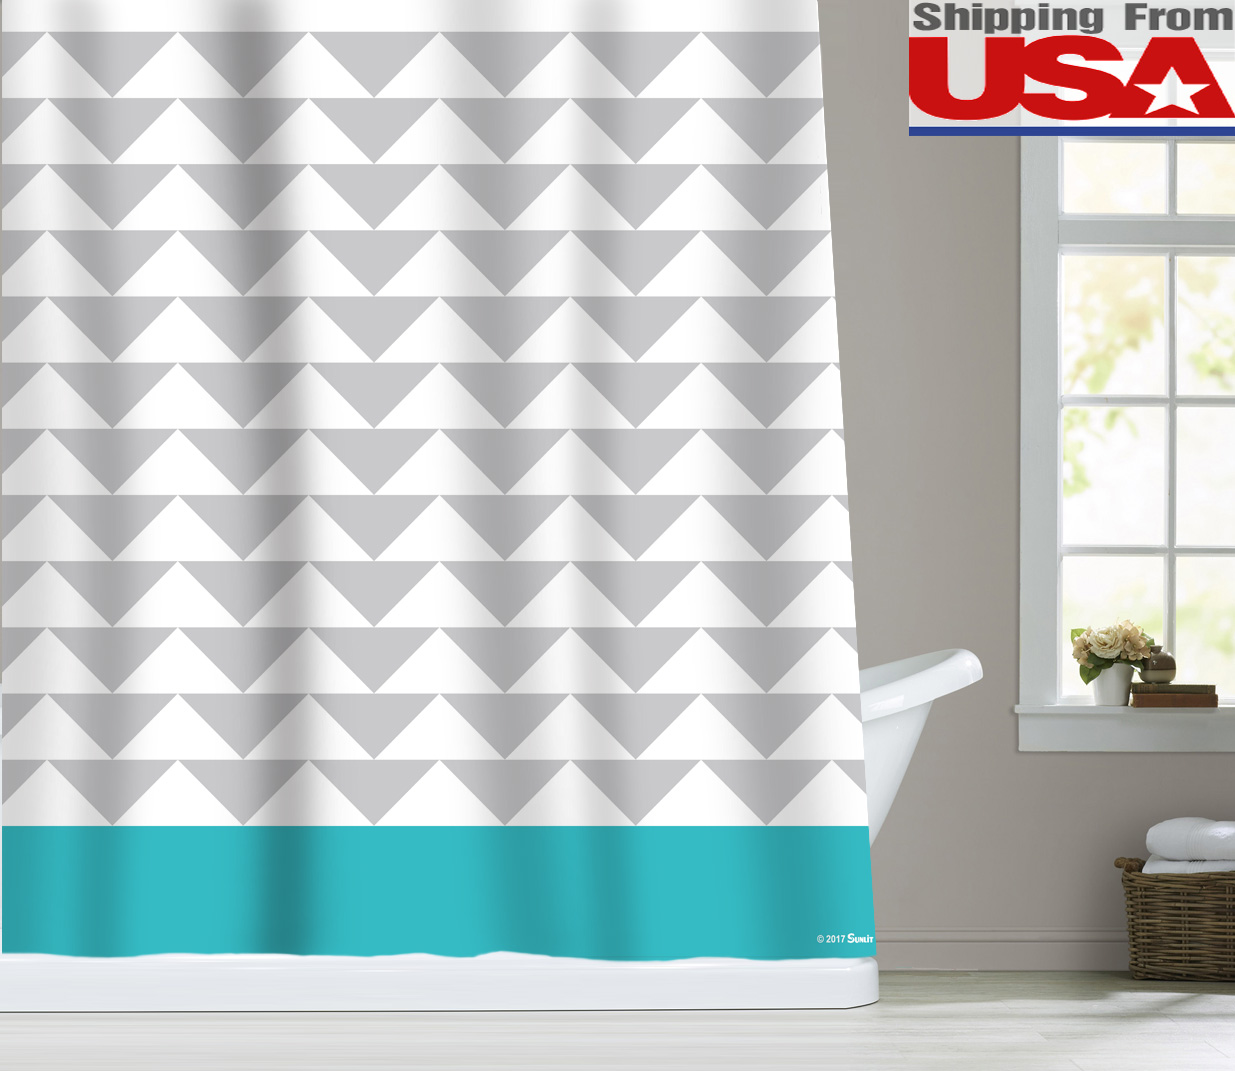 Stripes Chevron Triangle Waterproof Fabric Bathroom Shower Curtain ...